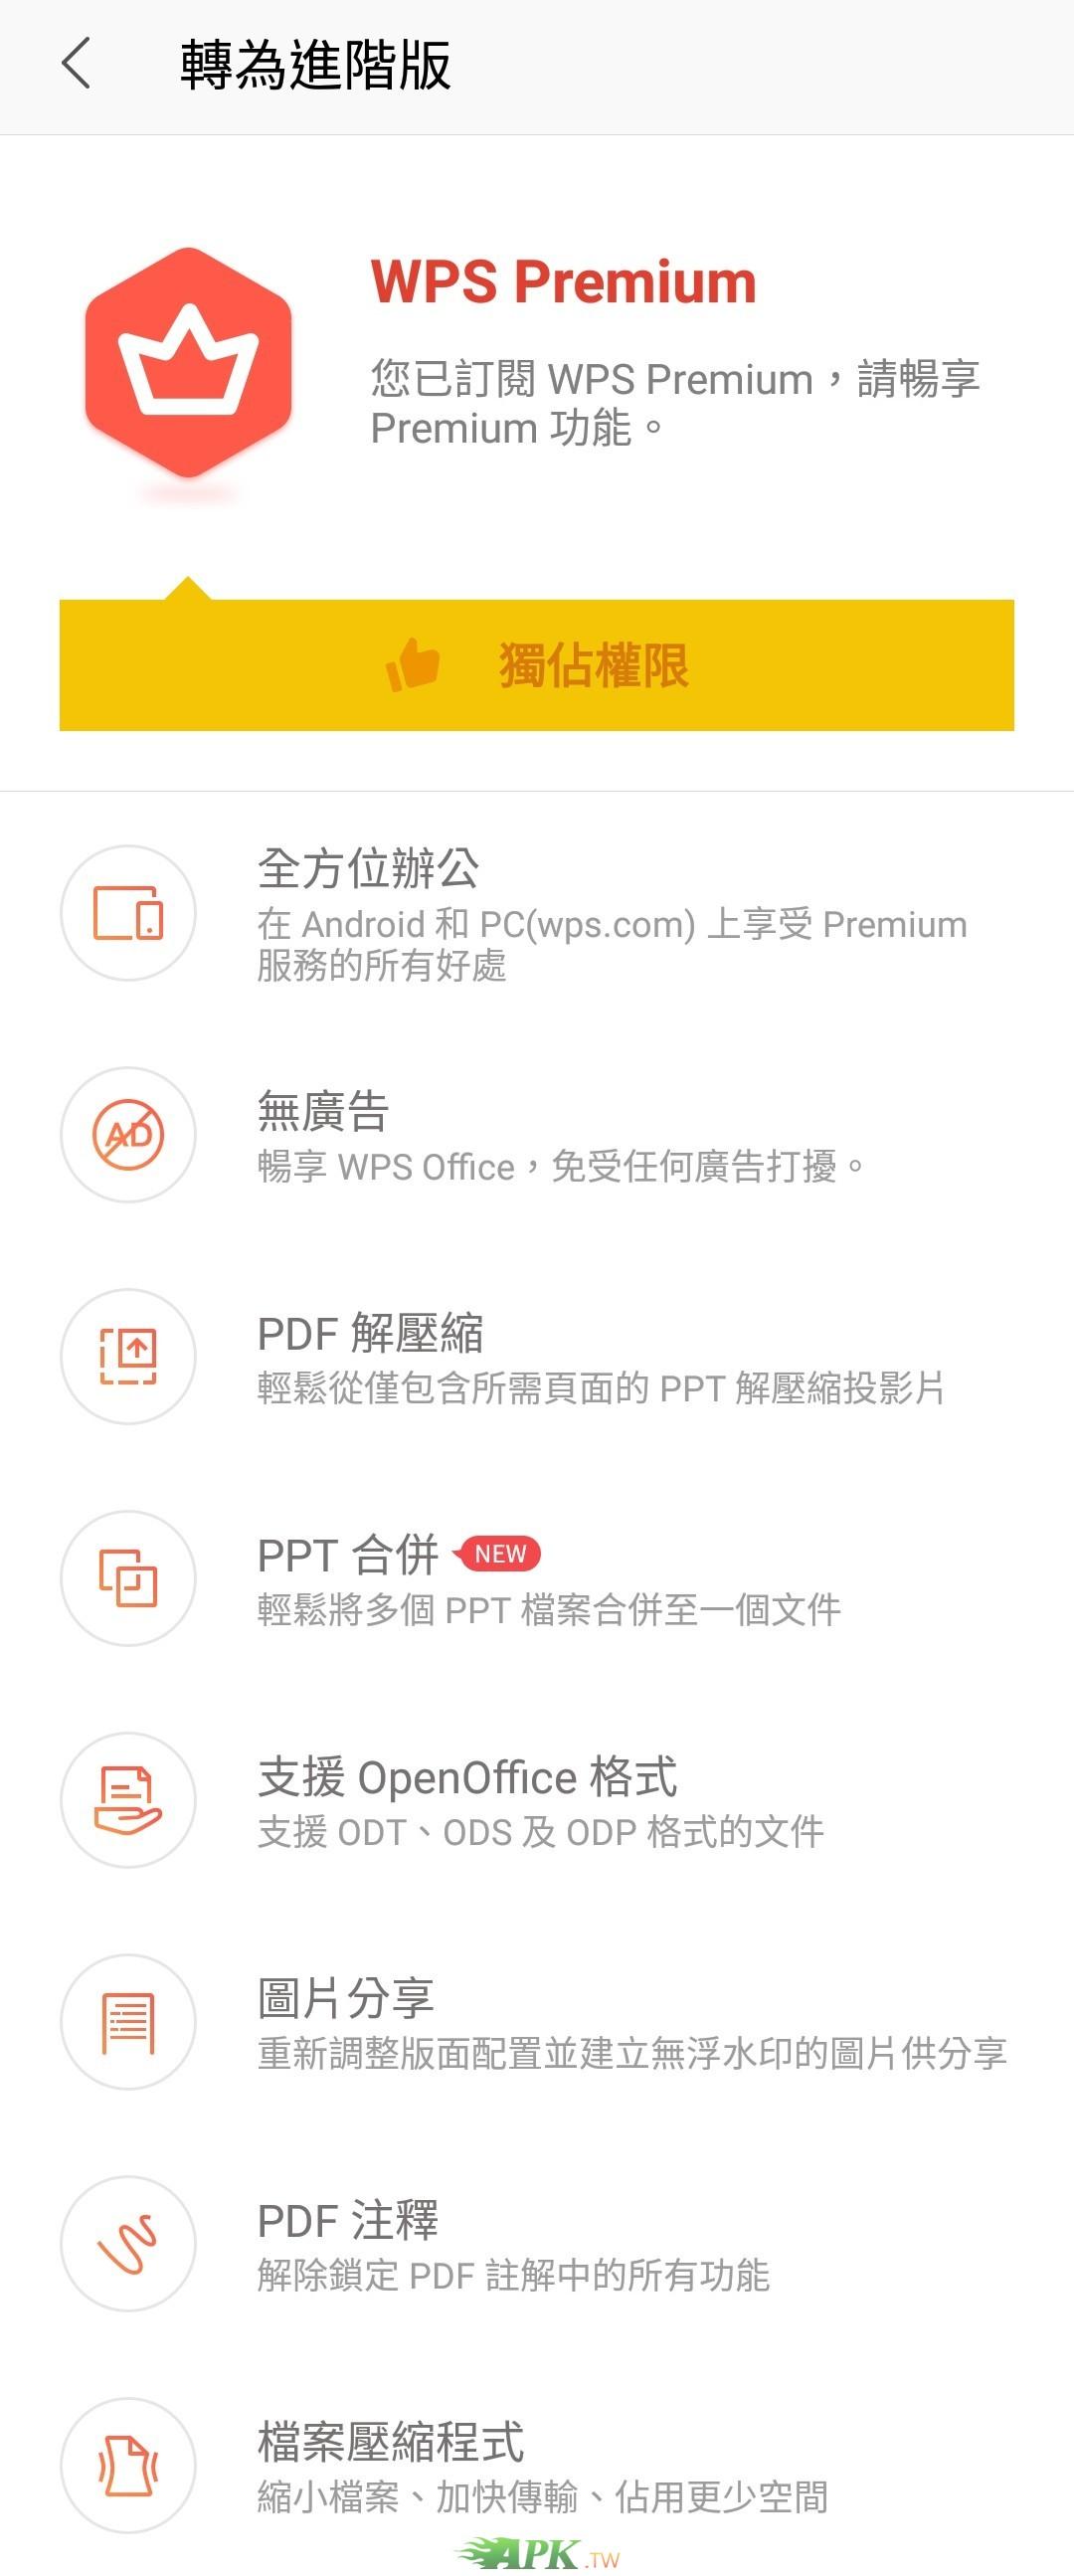 WPSOffice__1.jpg